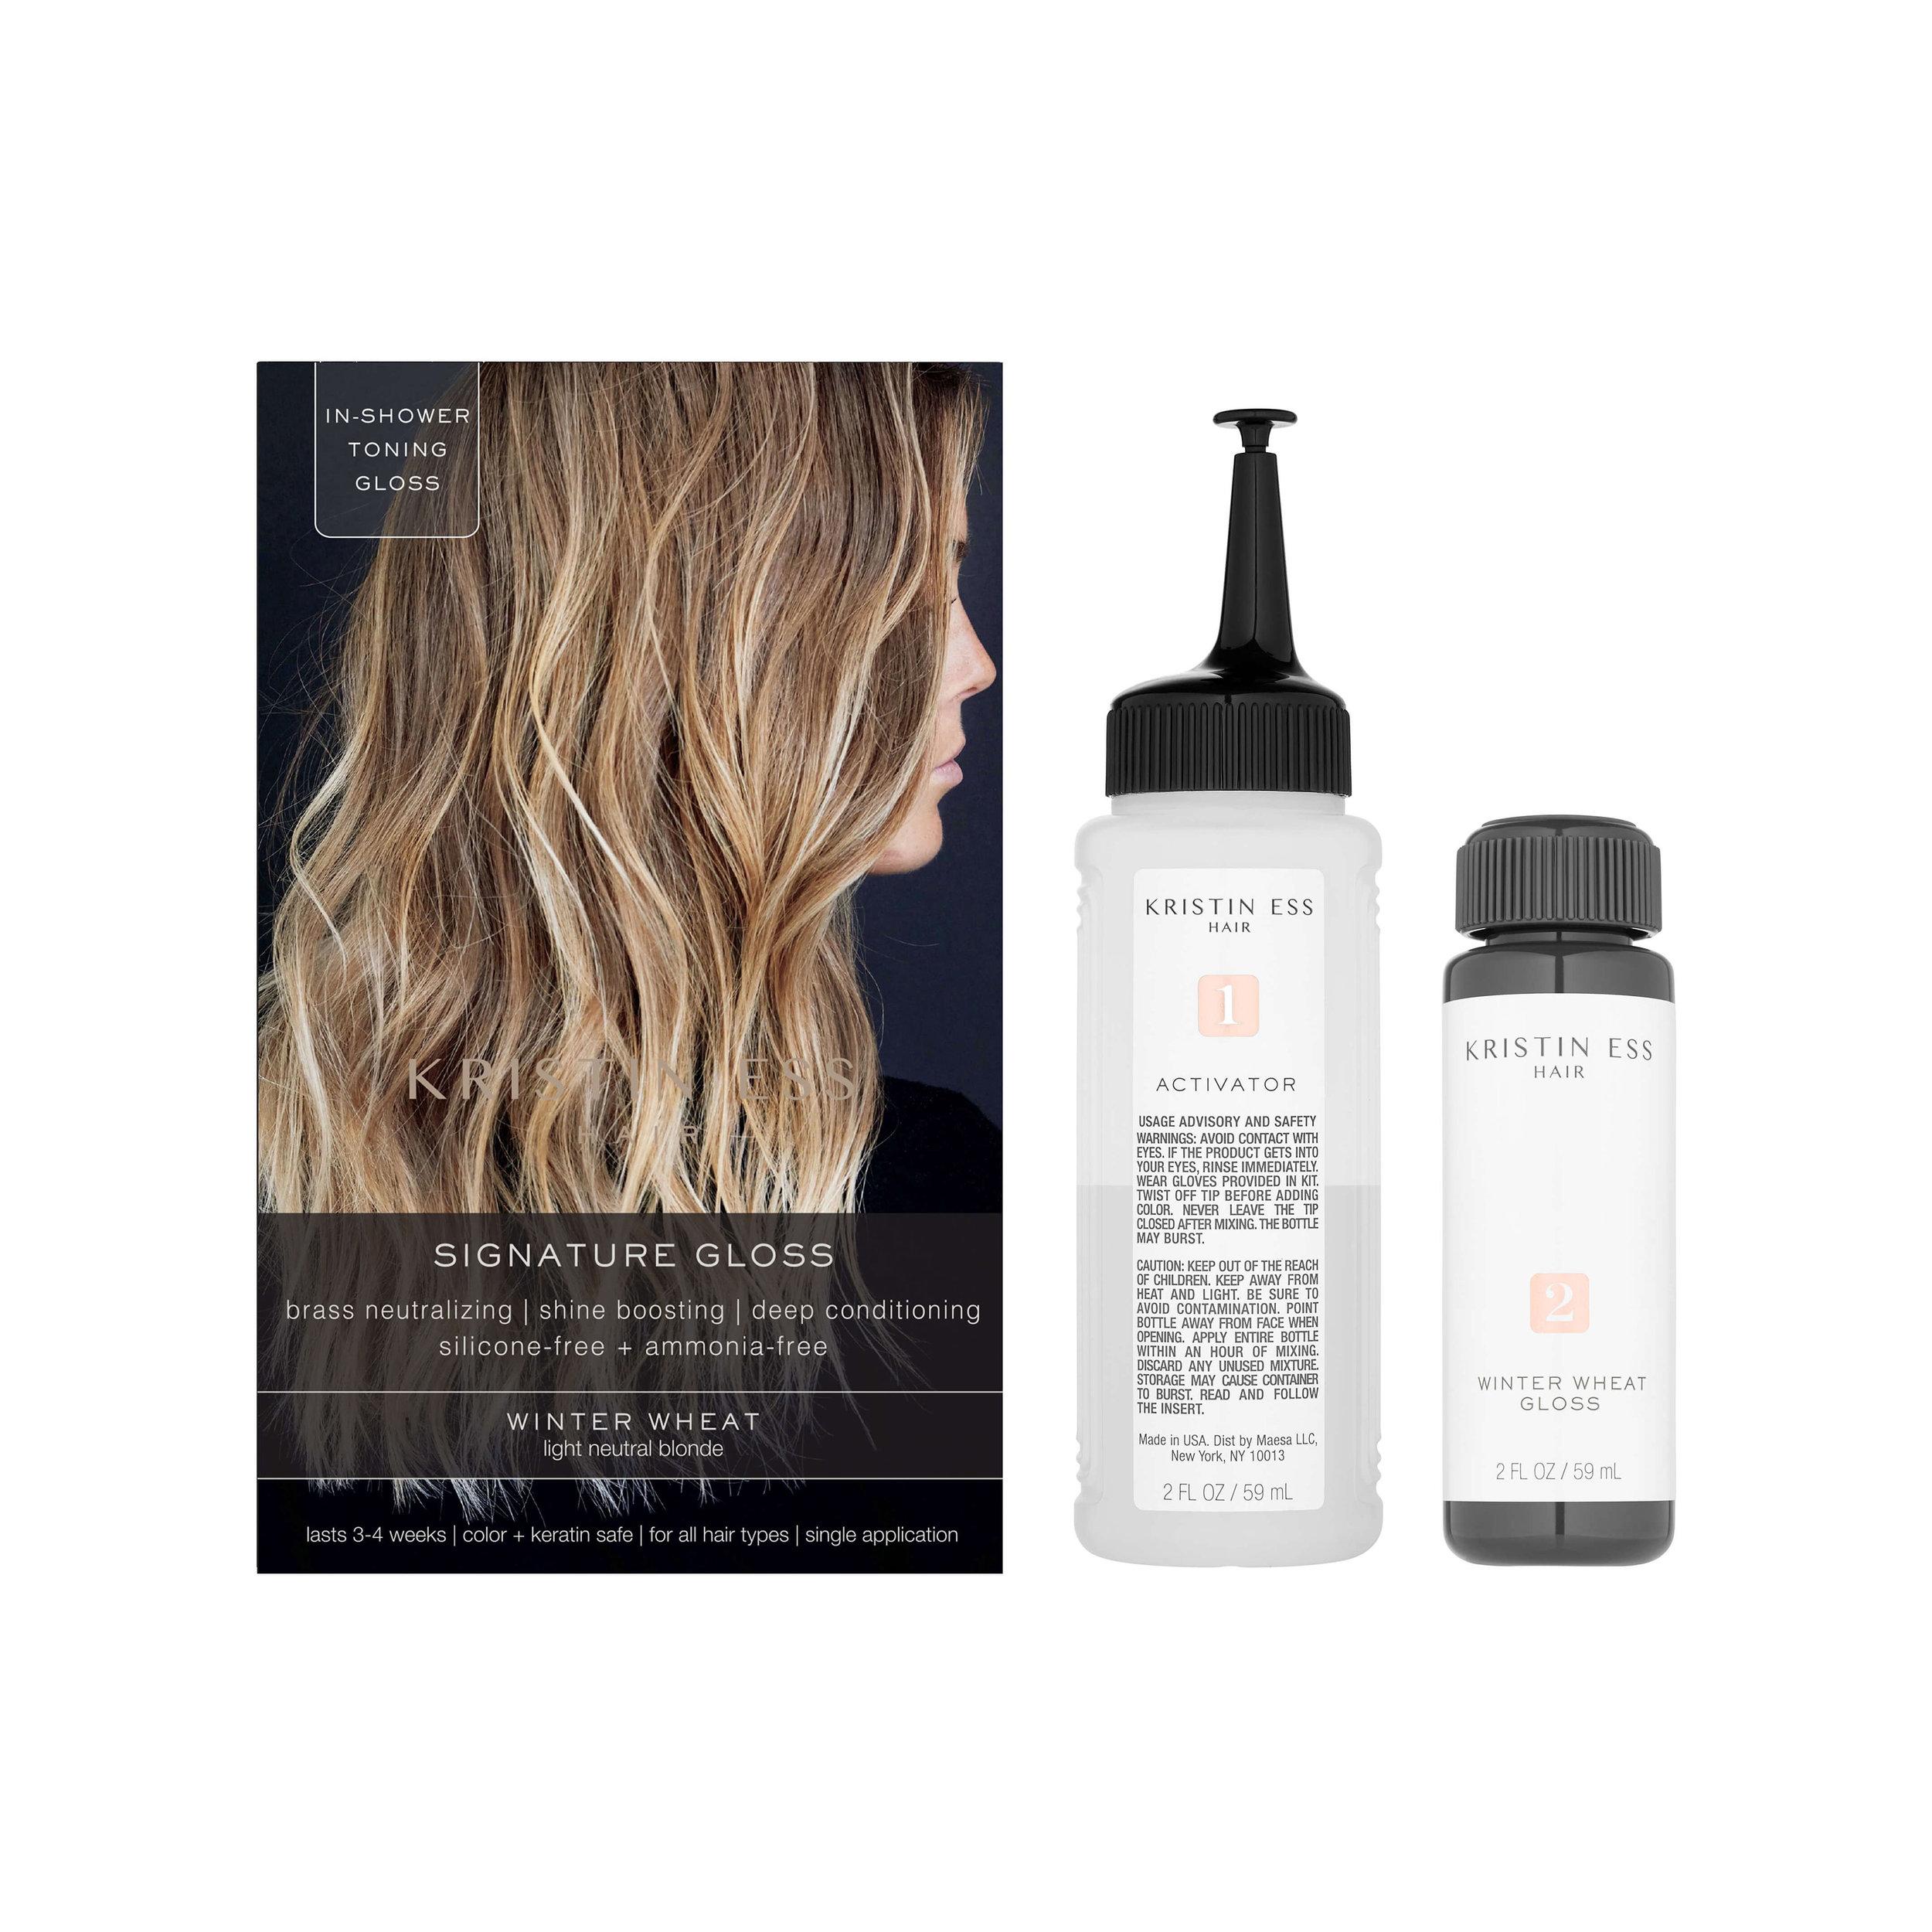 Signature Hair Gloss Winter Wheat Light Neutral Blonde Kristin Ess